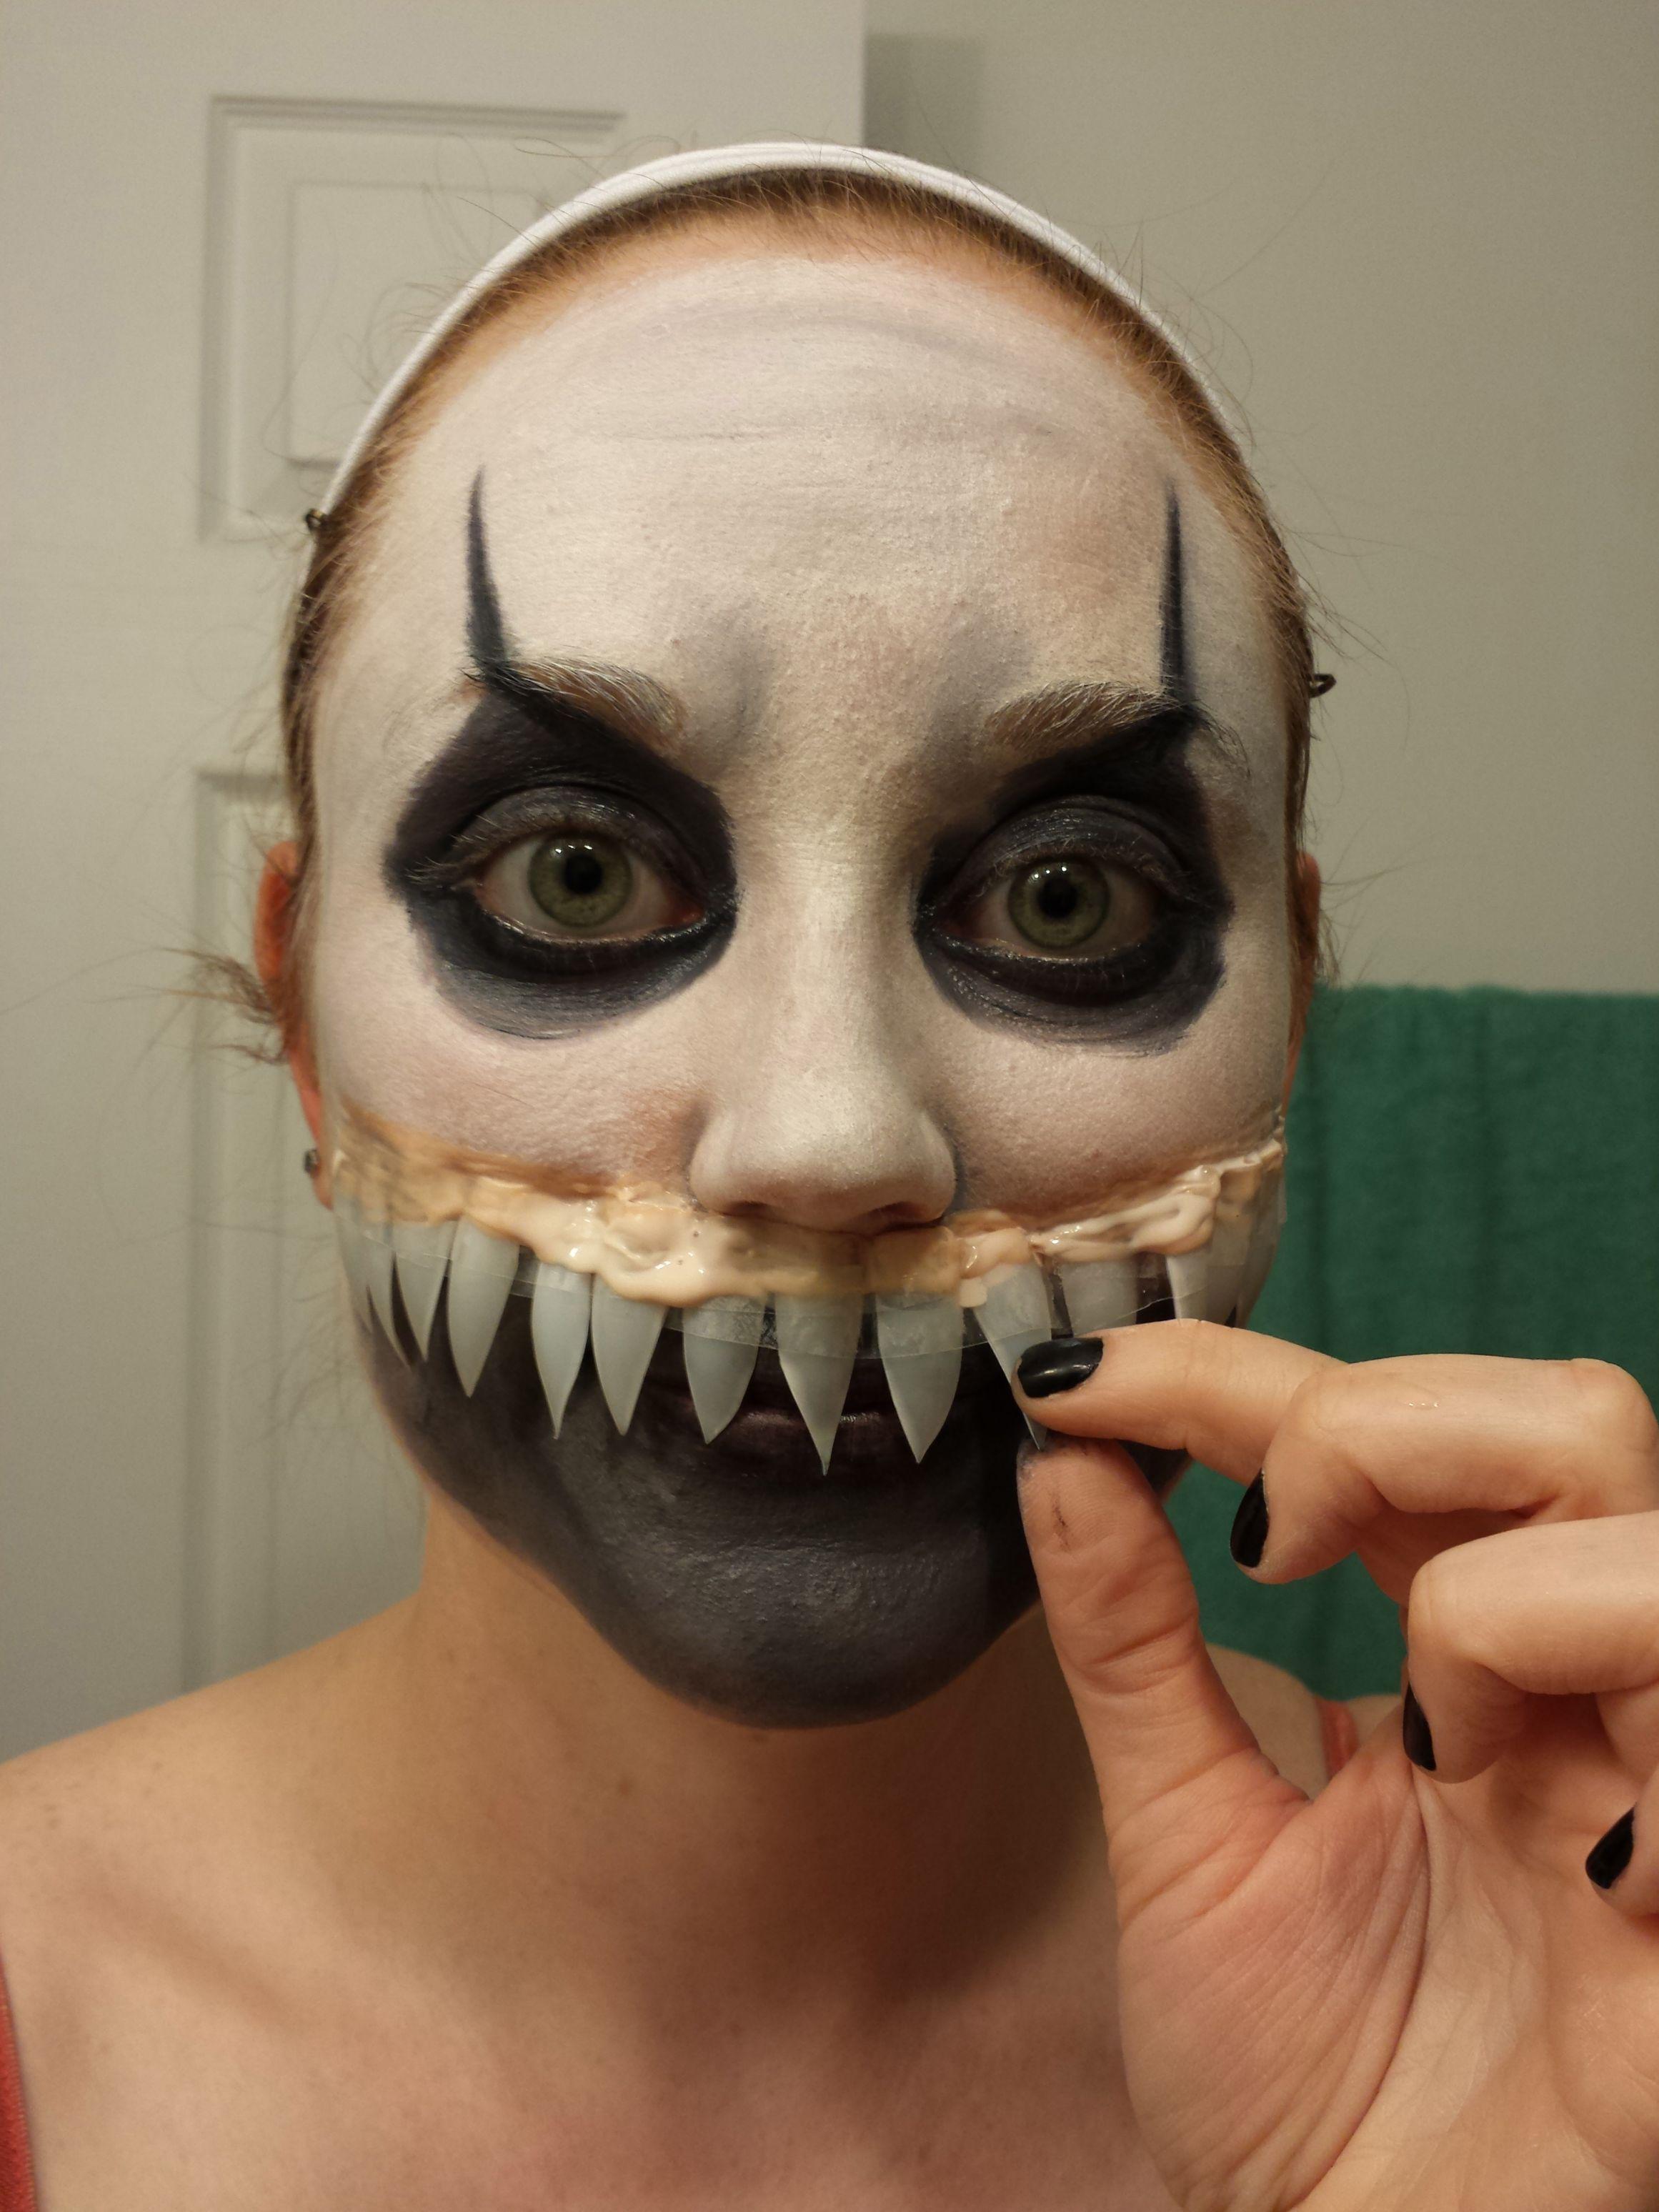 fake nails as teeth - Google Search | Halloween makeup ...